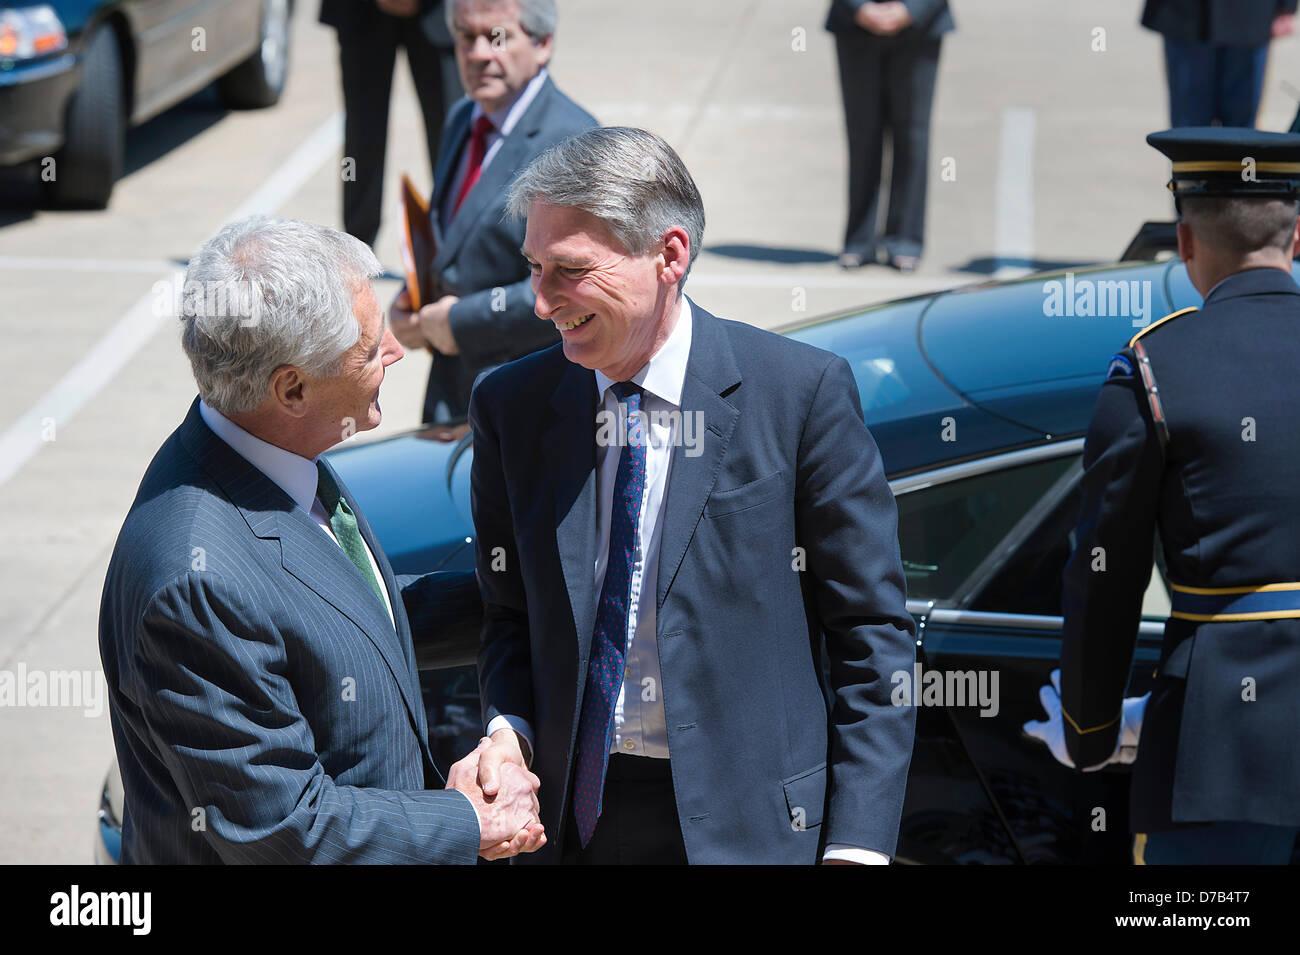 US Secretary of Defense Chuck Hagel welcomes British Defence Secretary Phillip Hammond to the Pentagon May 2, 2013 - Stock Image